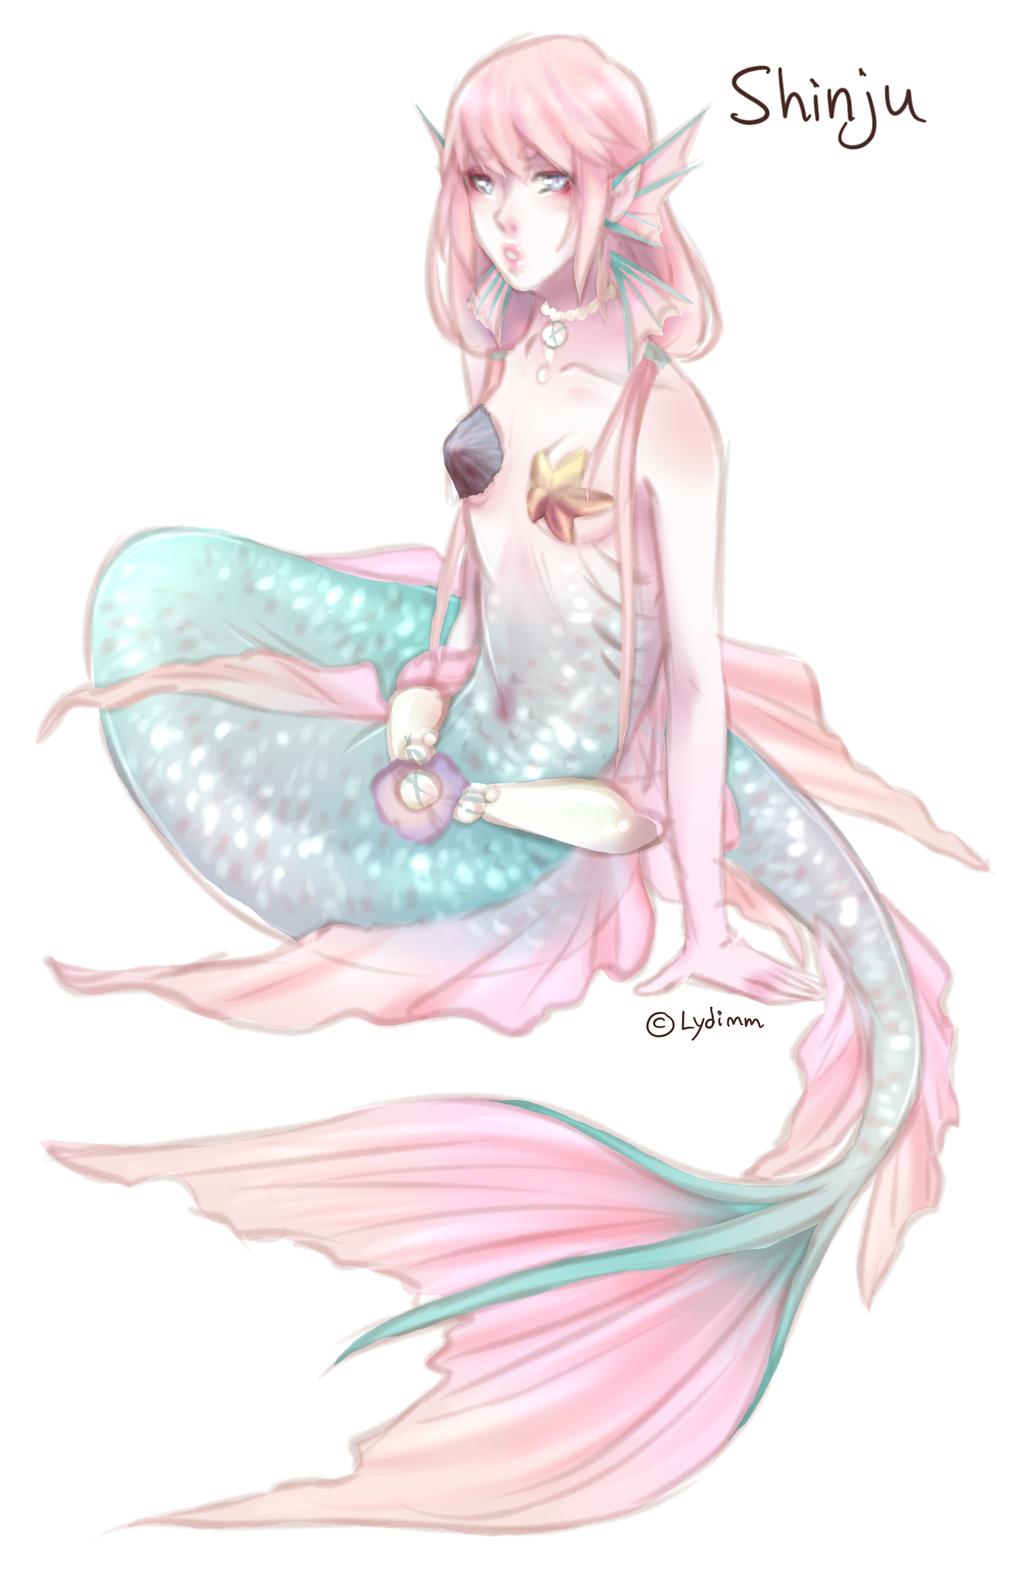 Little Mermaid OC By Iydimm On DeviantArt